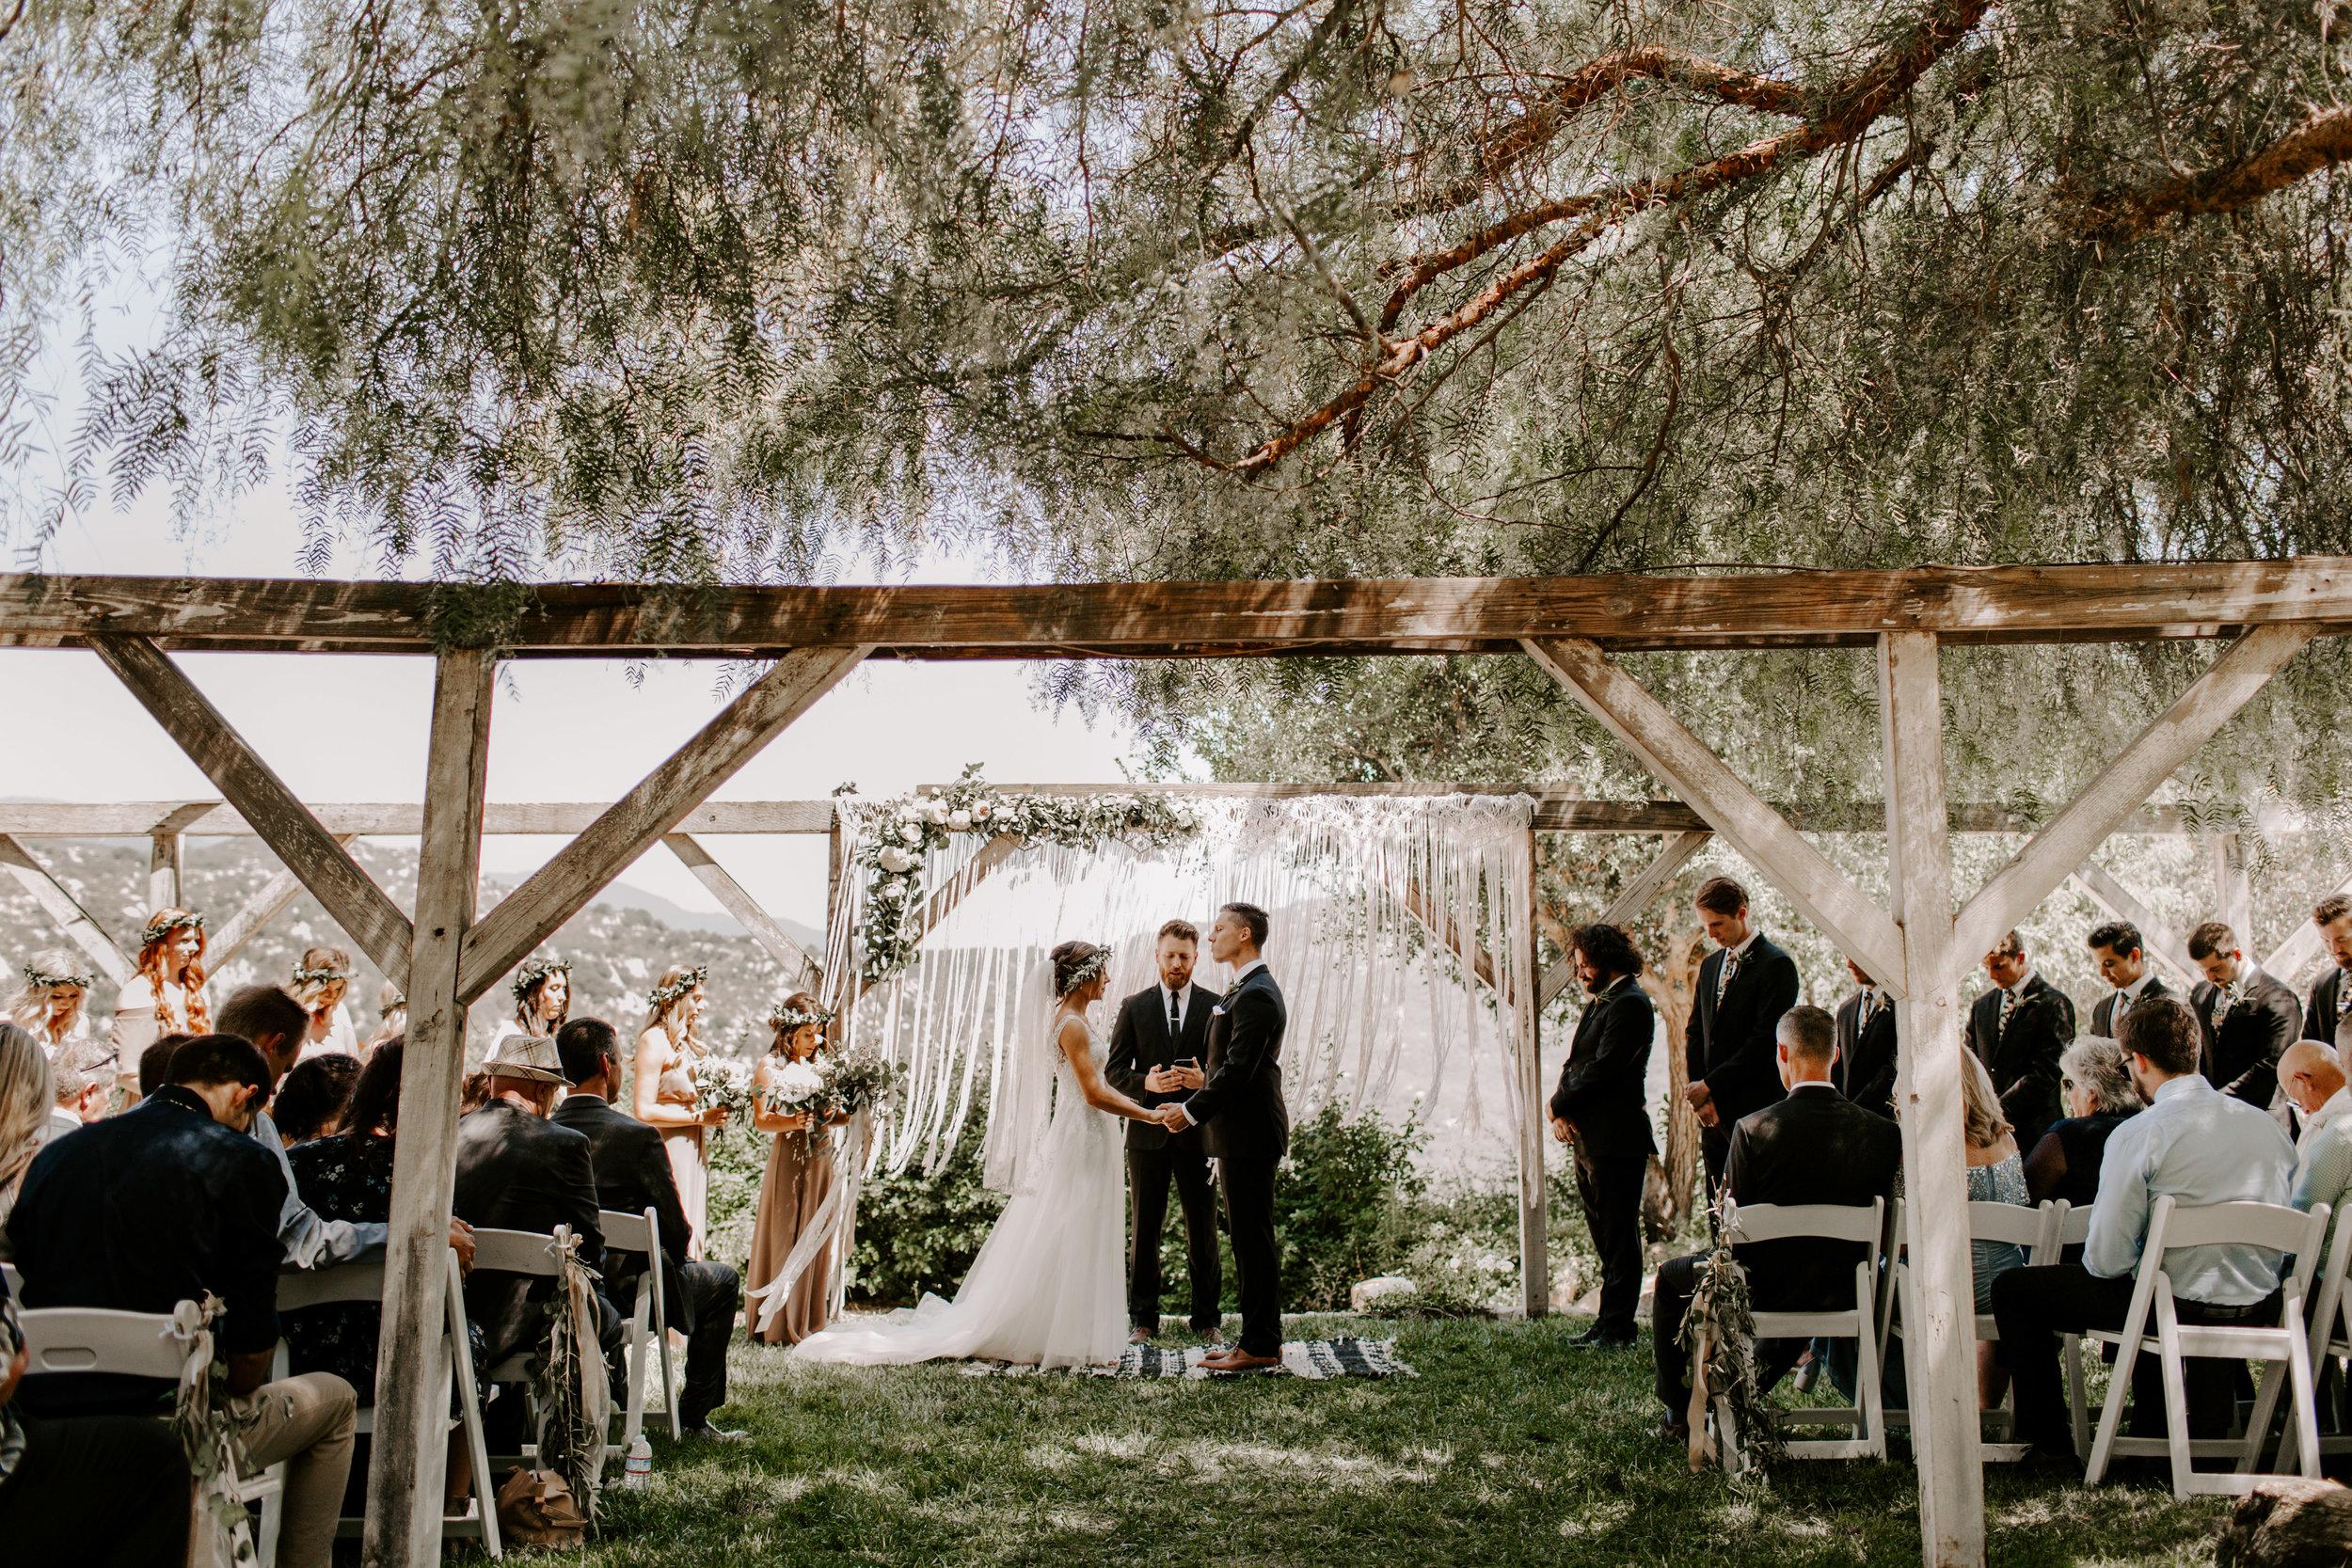 kate+zack_wedding_secludedgardenestate_temecula_madisonrylee_0299.jpg